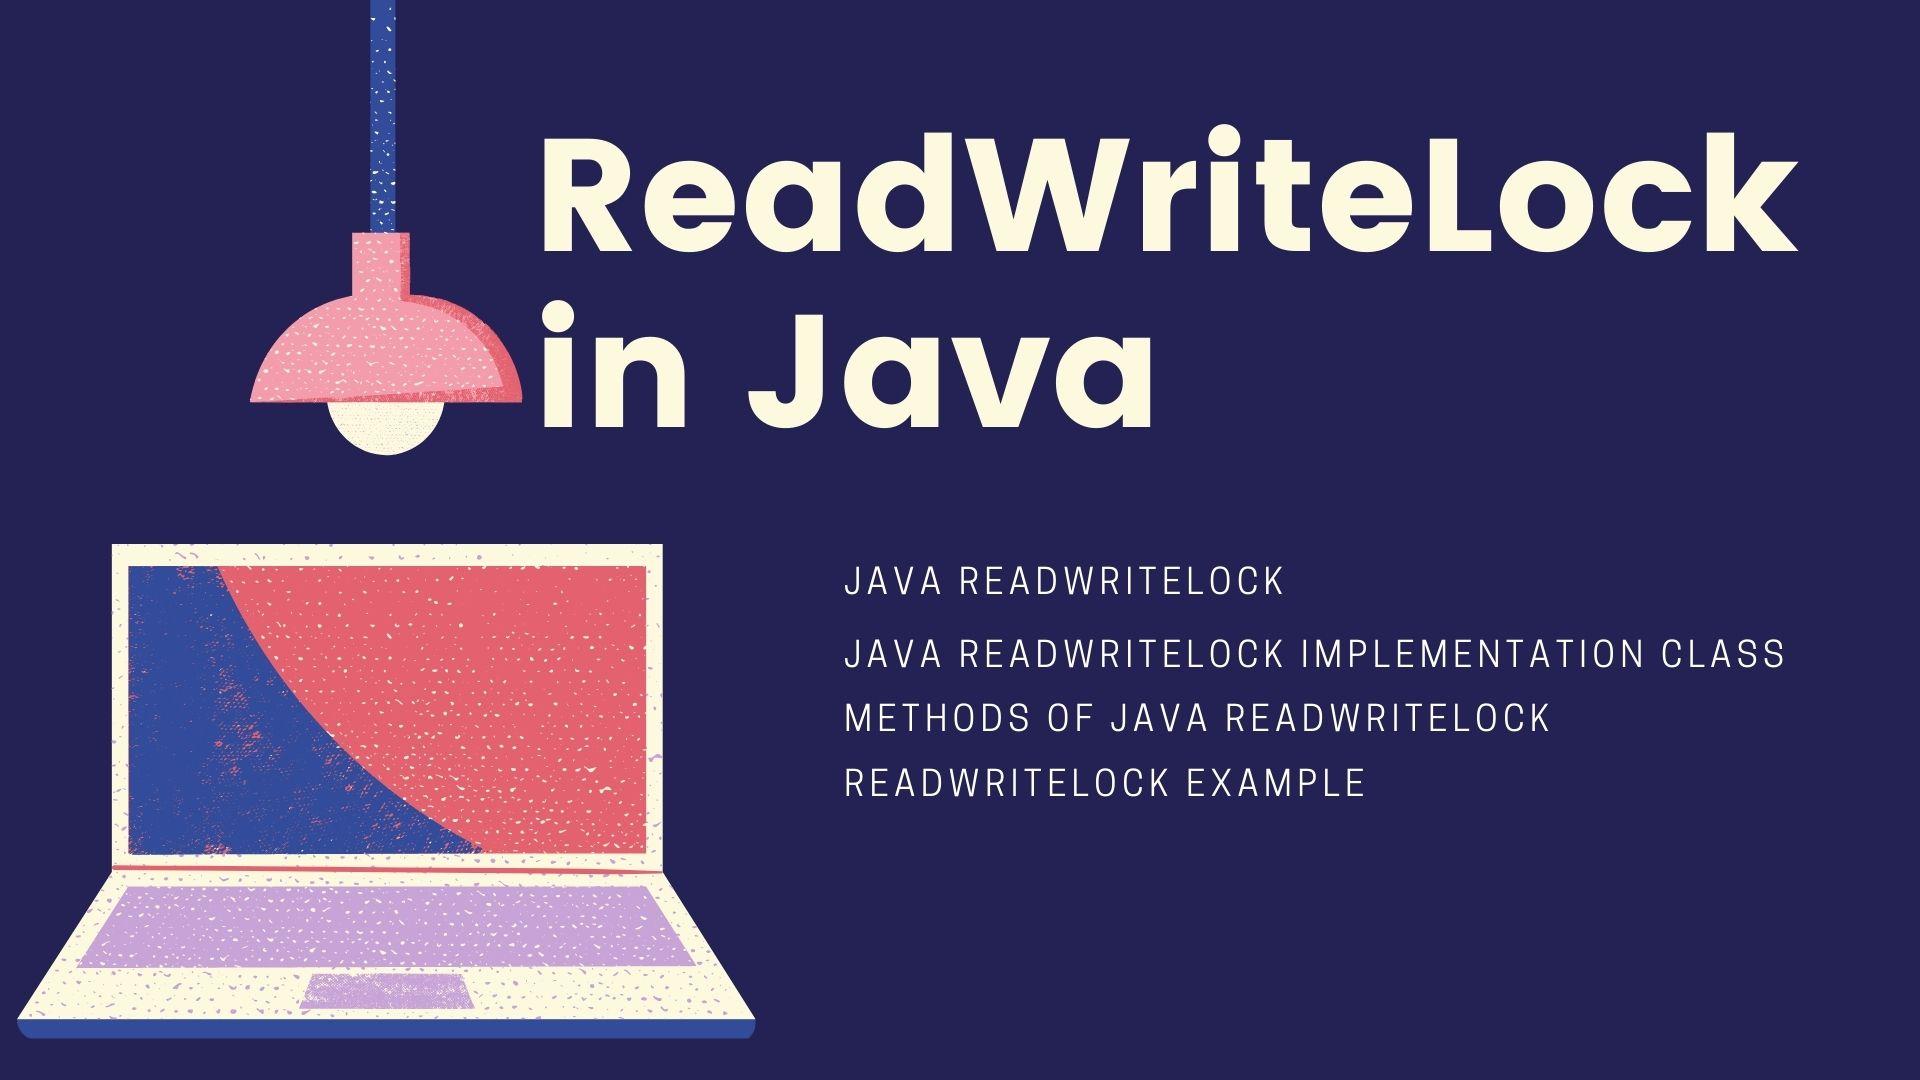 ReadWriteLock in Java